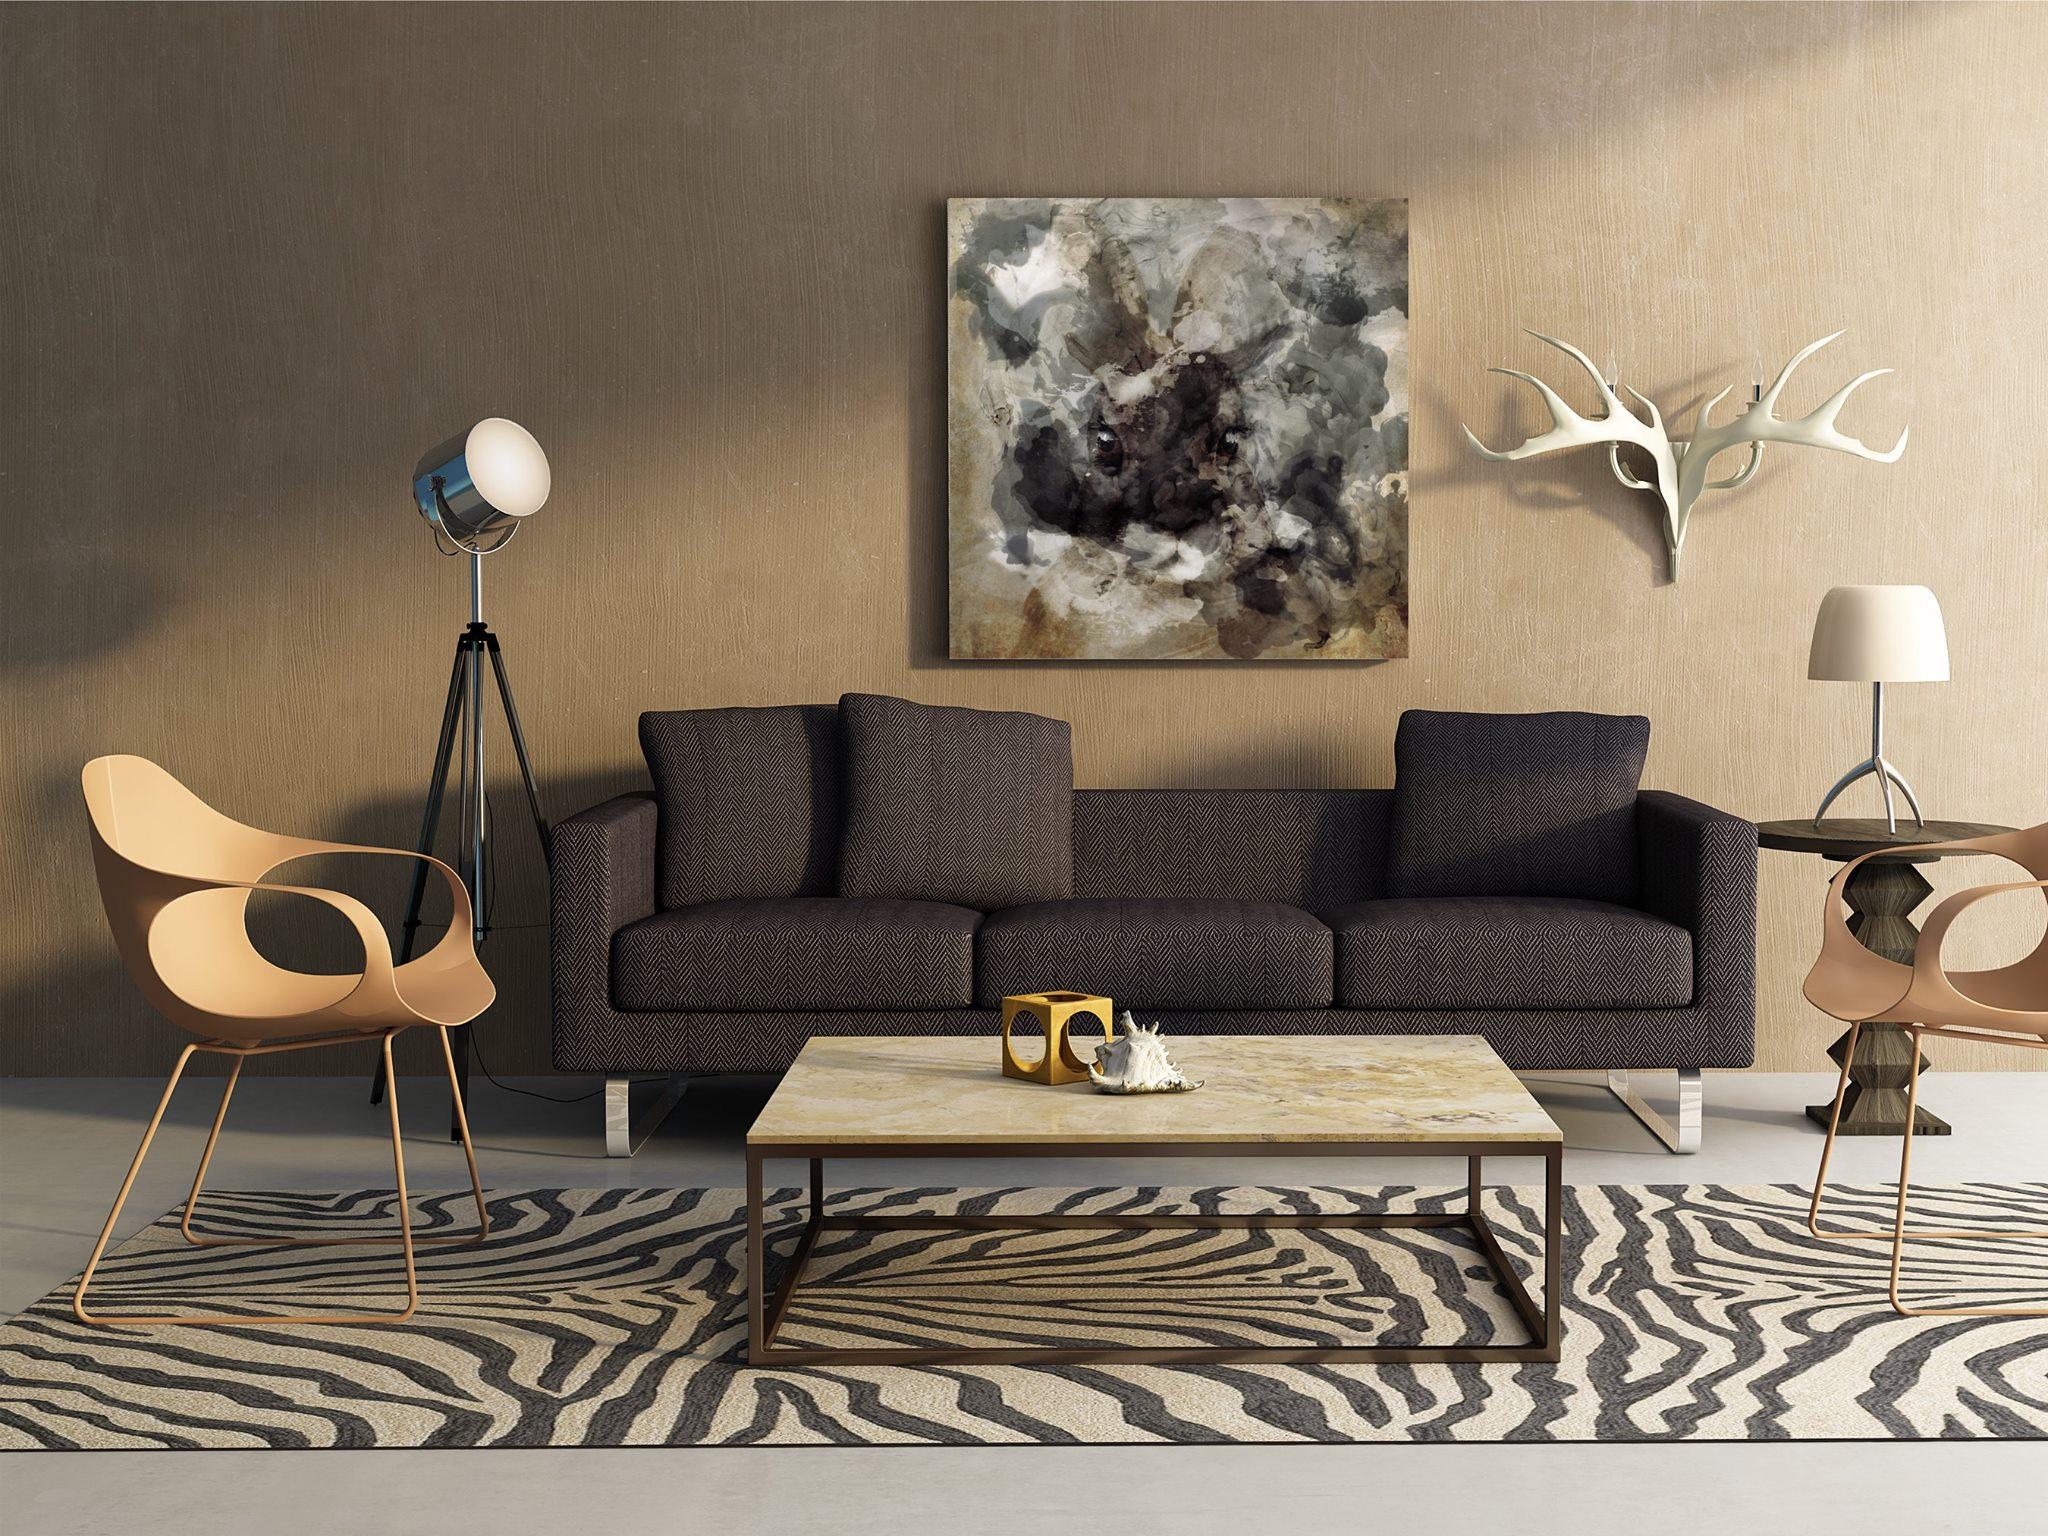 ArtBoja Custom Art Prints in the Den